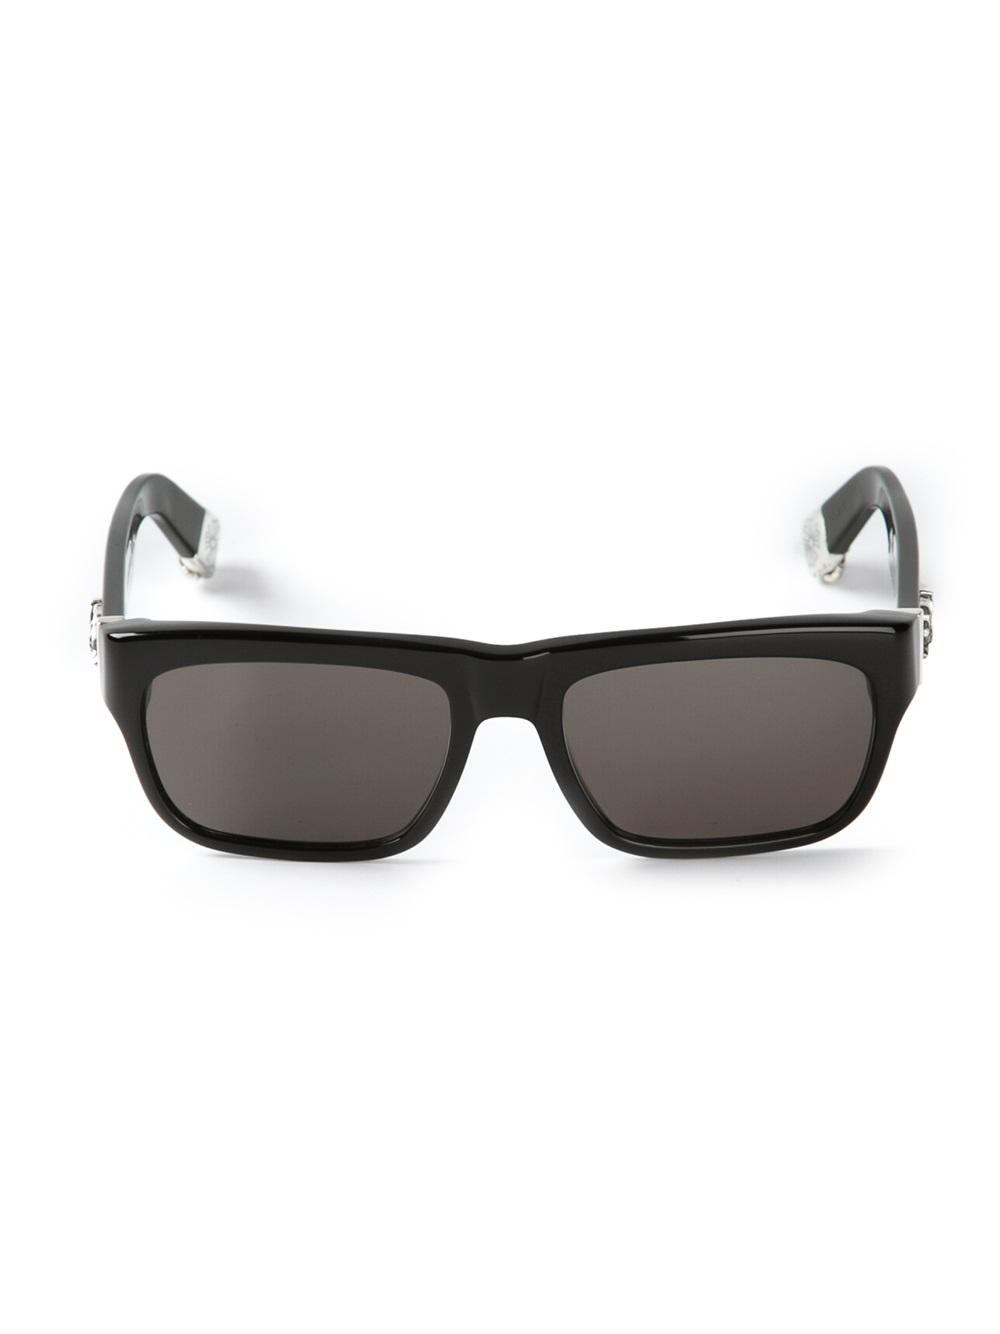 4b3a31f4c10 Mens Chrome Hearts Sunglasses For Sale